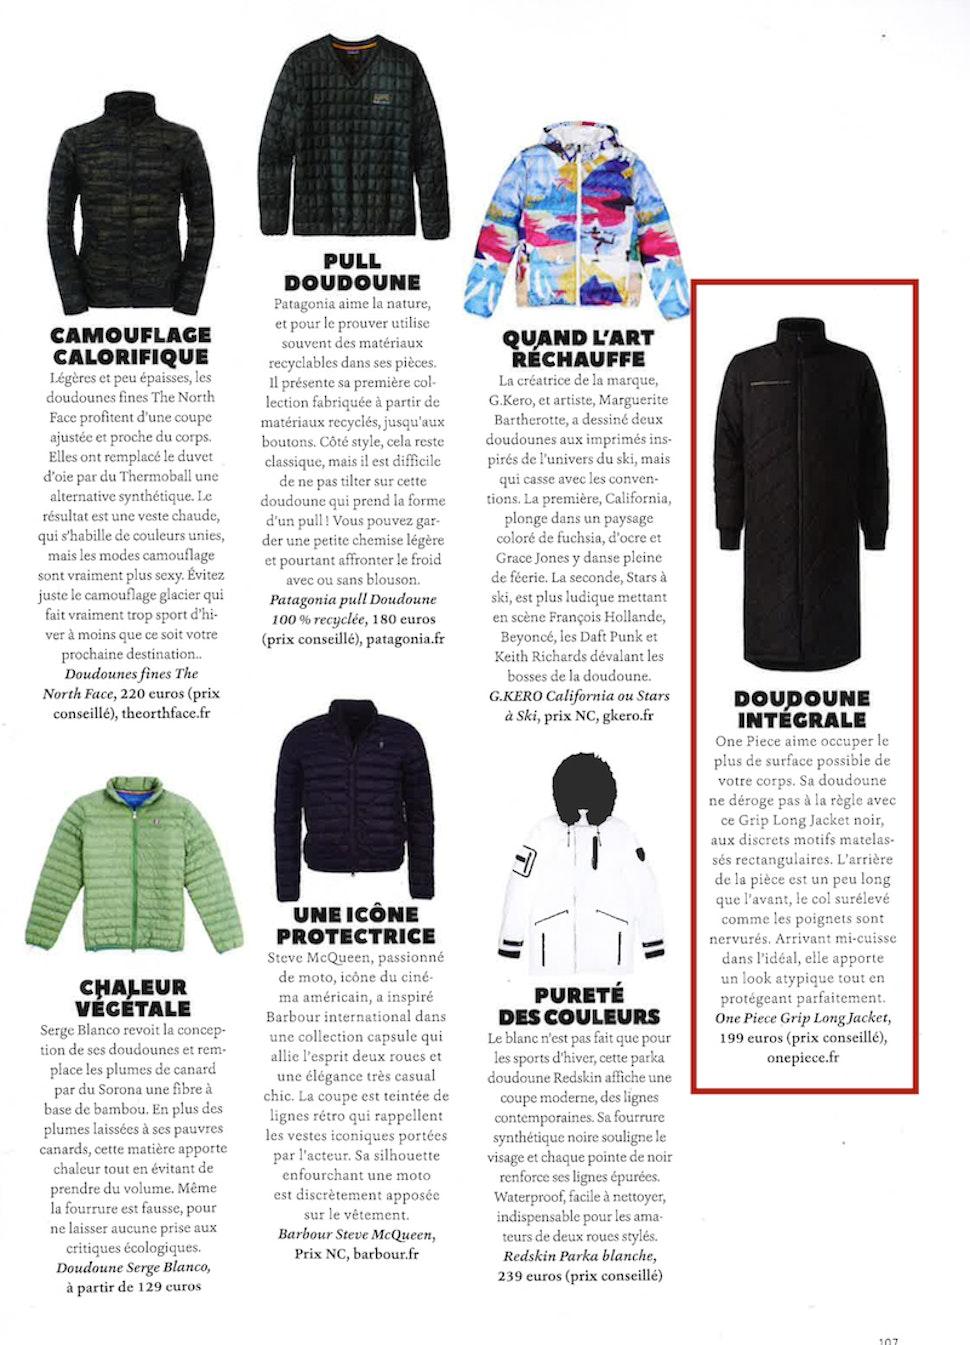 Onepiece dans Plugged Magazine